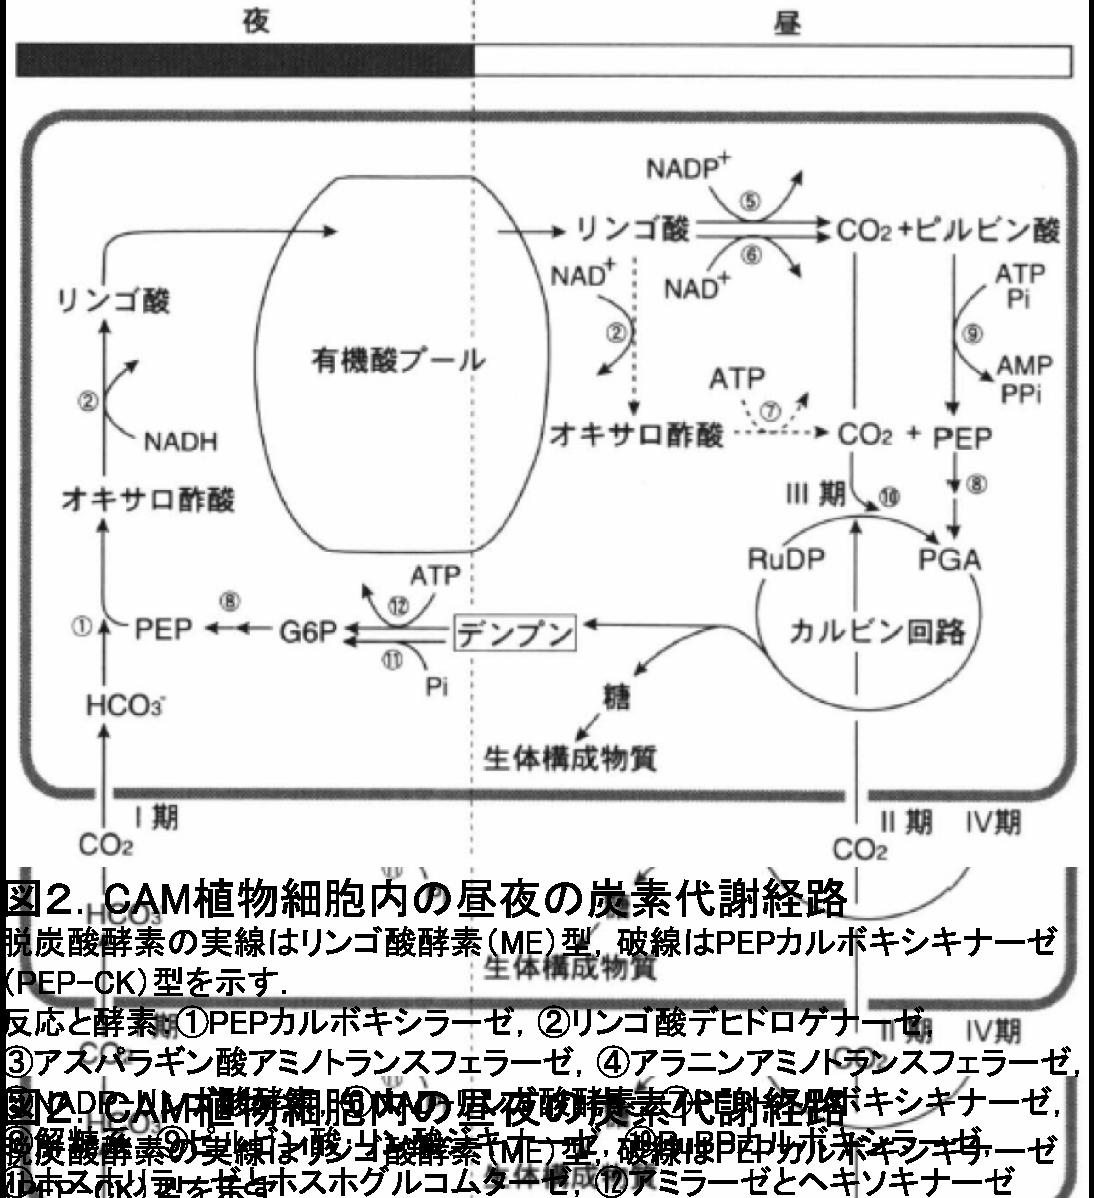 CAM path (Ph 1-4).png